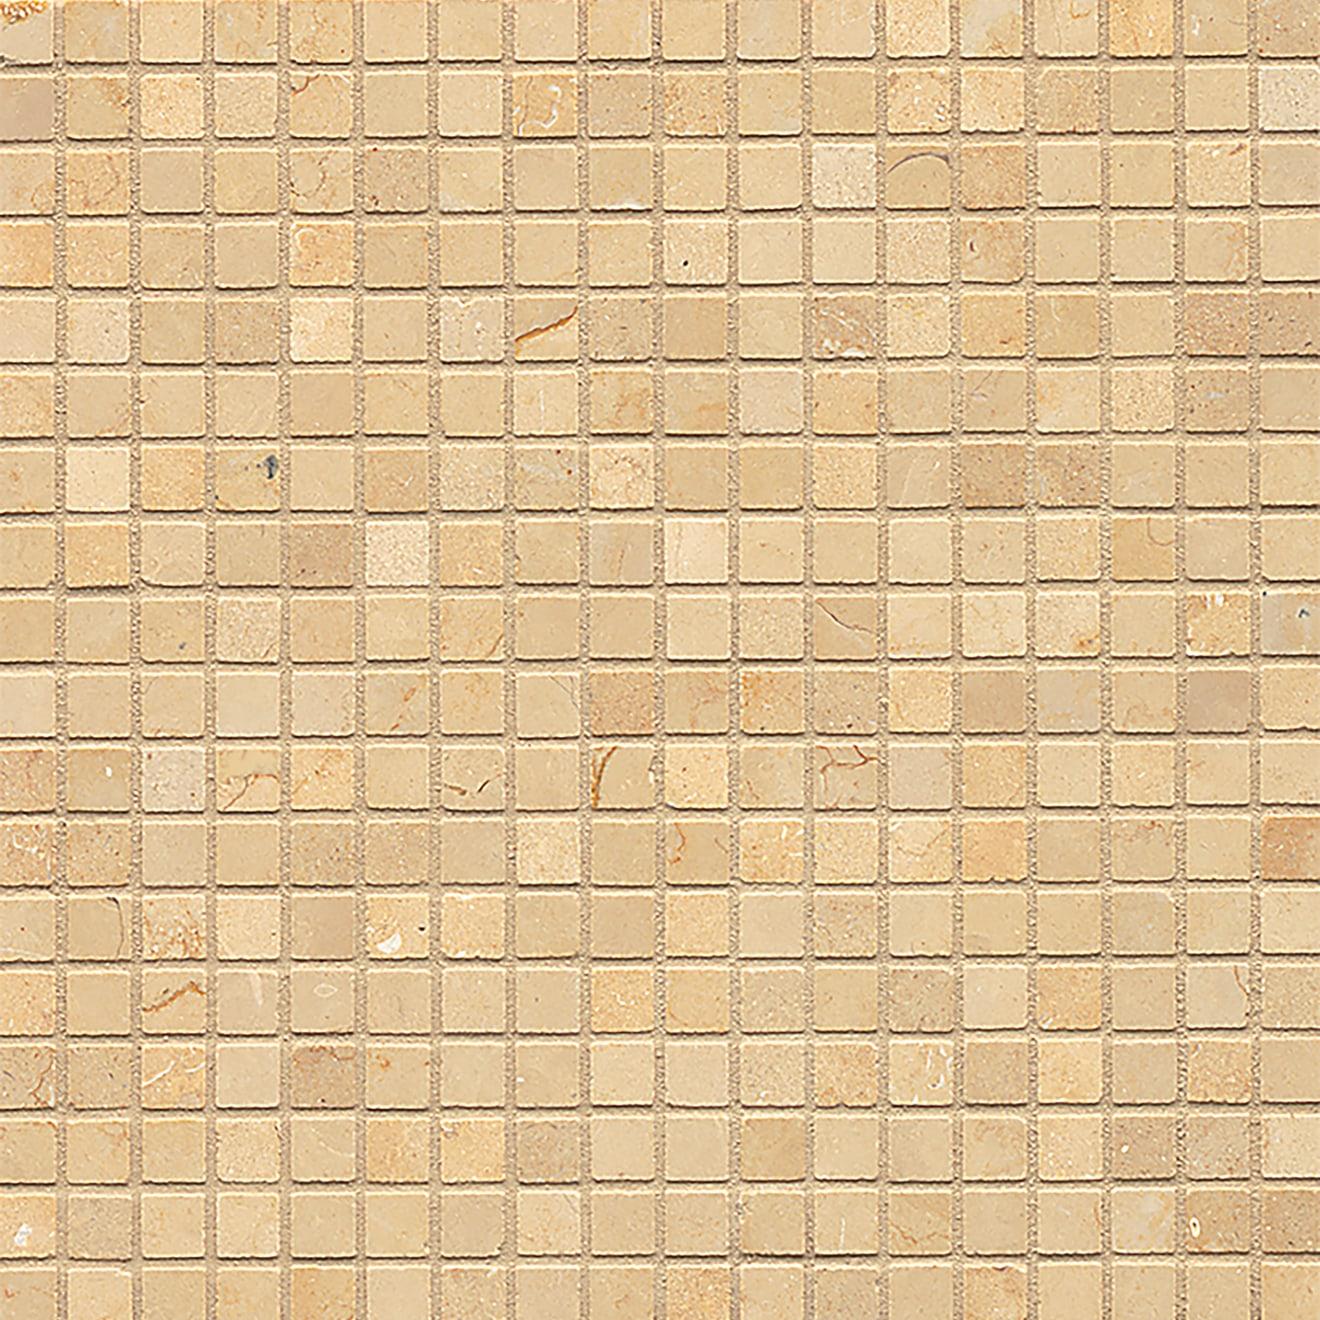 5/8X5/8 Mod Rocks Mosaic-Brioche